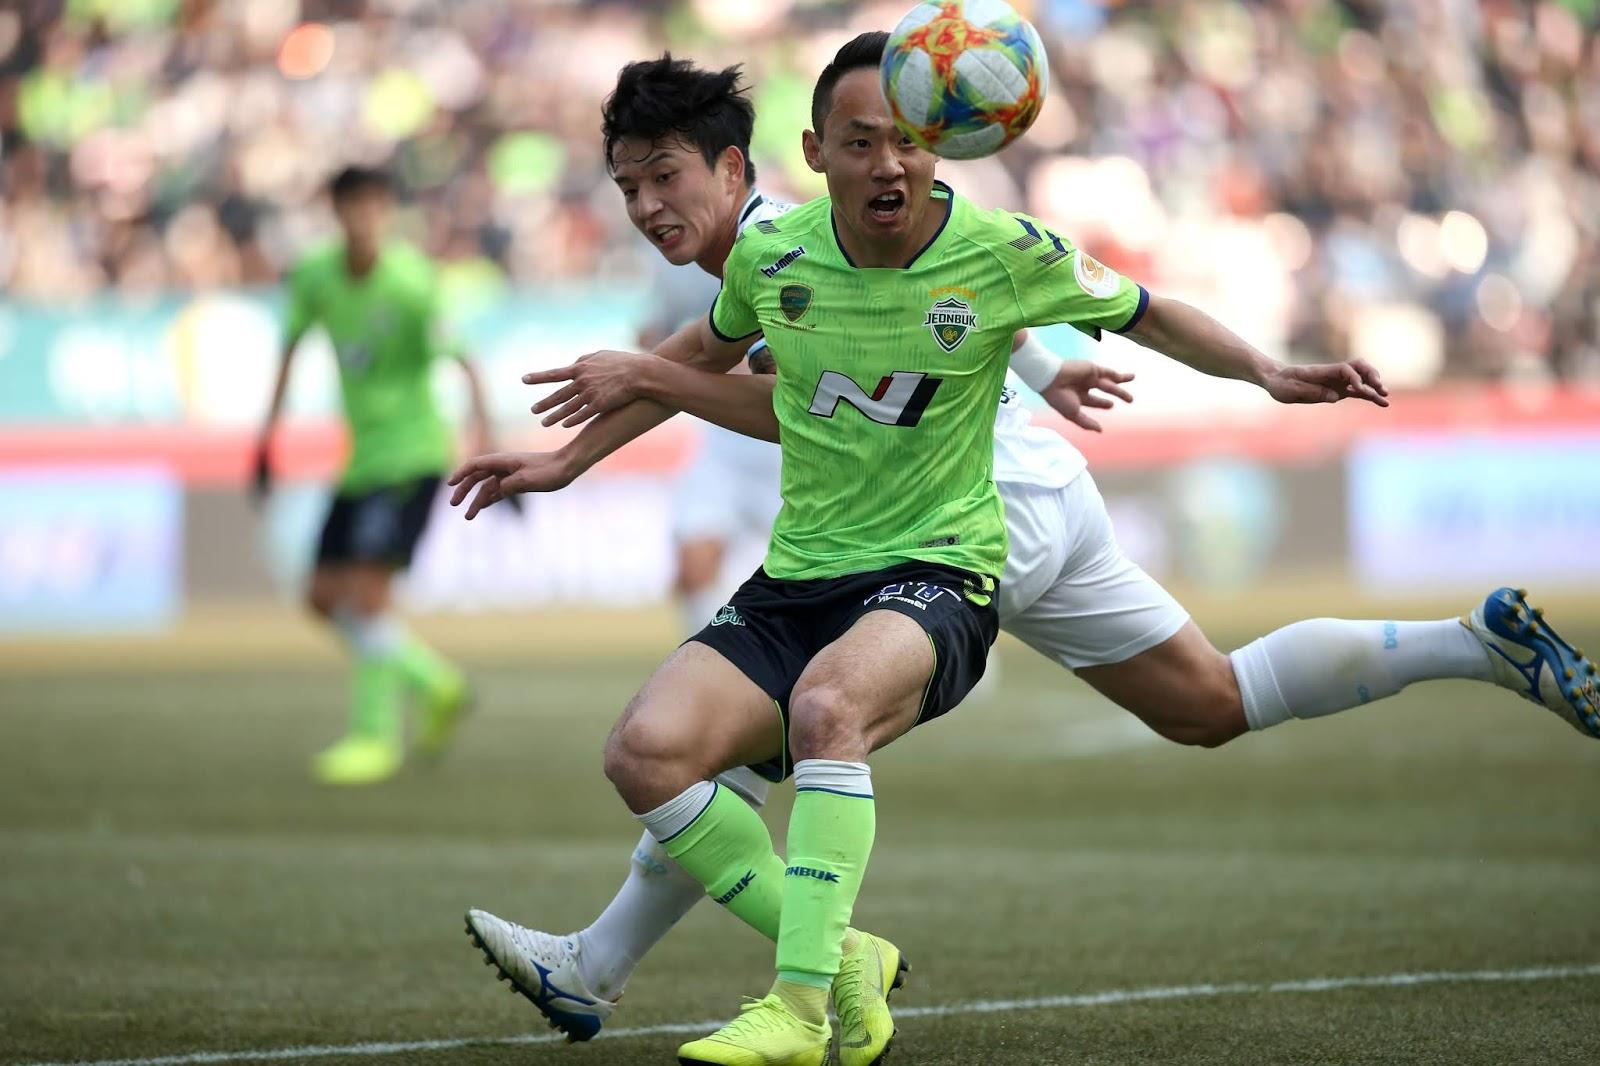 K League 1 2019 Match Preview: Jeonbuk Hyundai Motors vs Gangwon FC (Round 3)